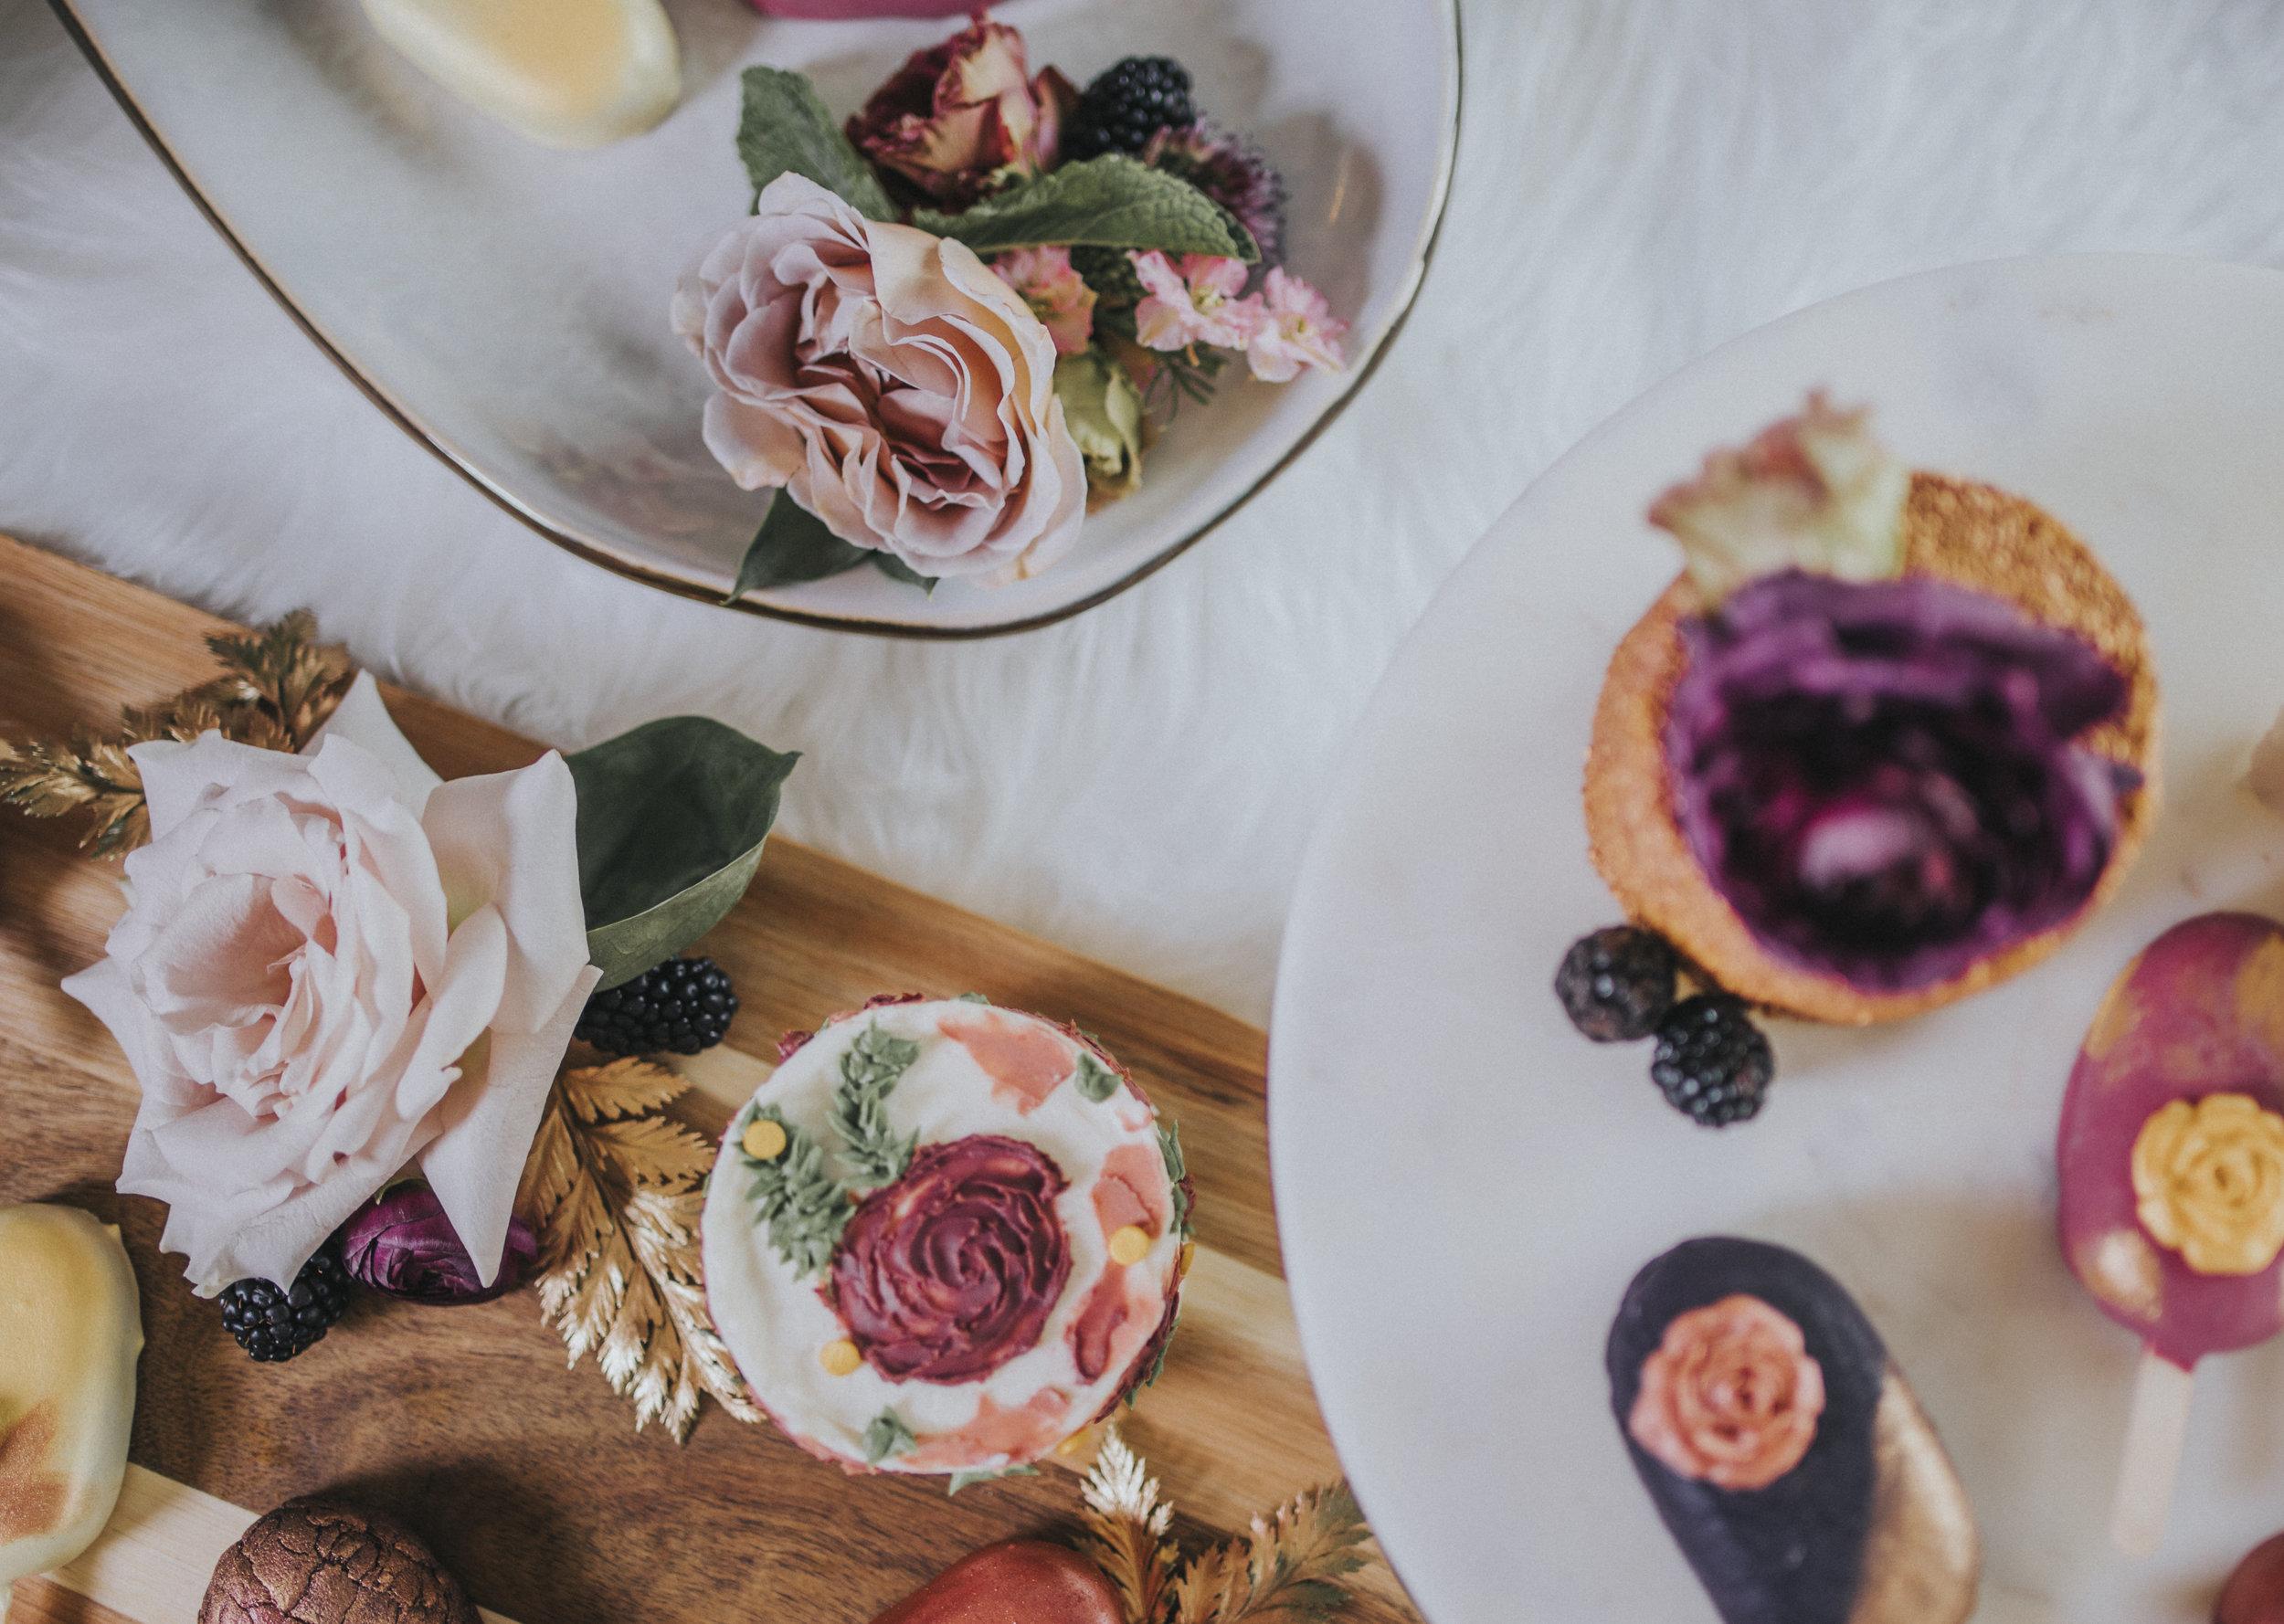 8  omaha-nebraska-empire-room-tiny-luxe-wedding-planner.jpg